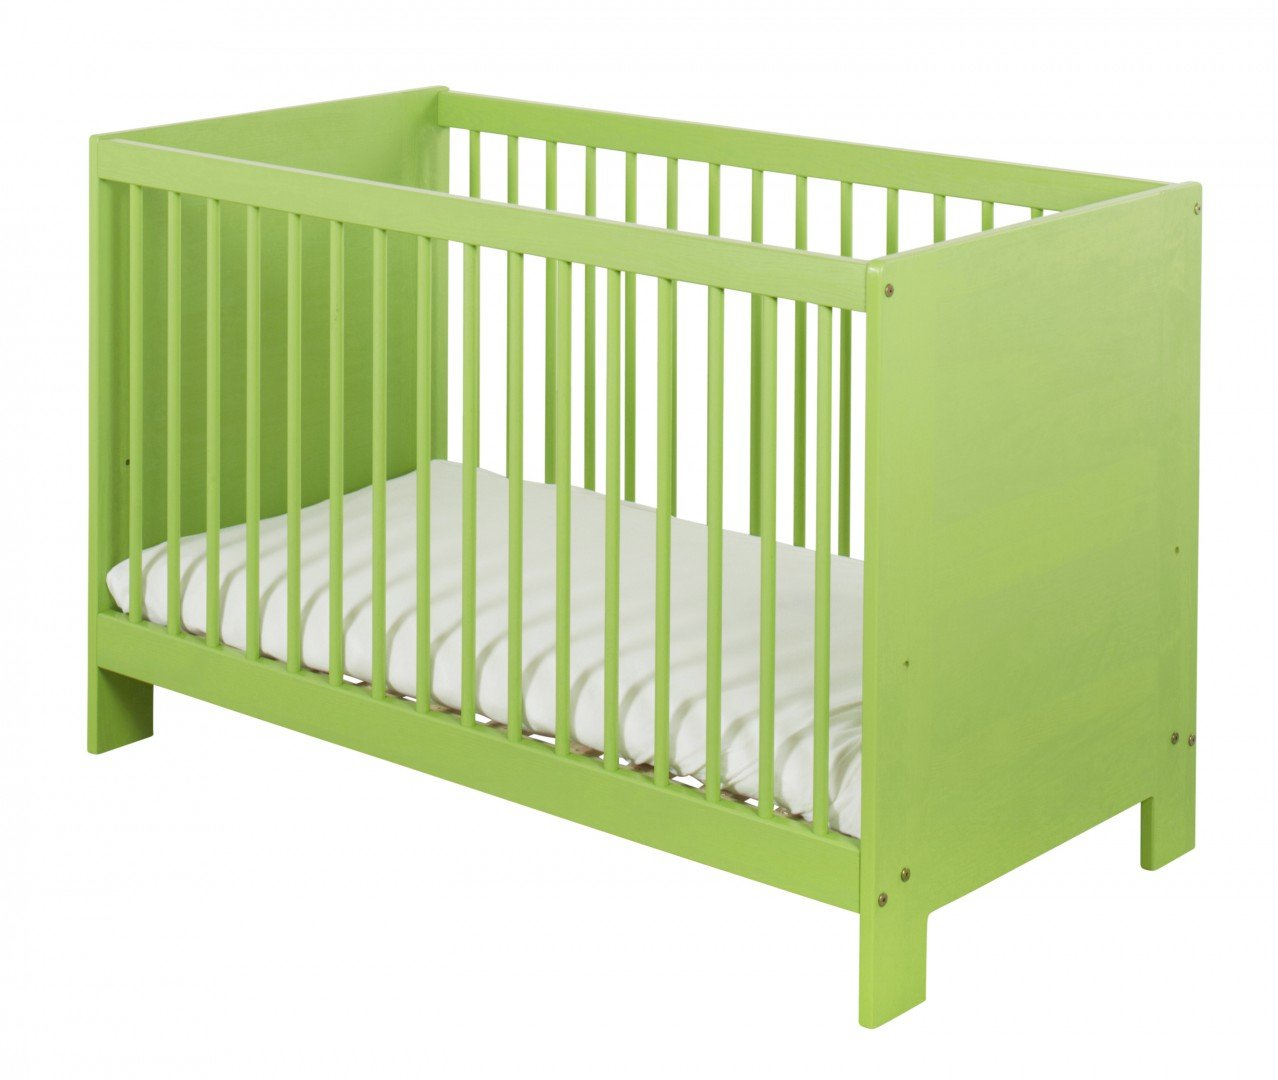 BioKinder 24004 Niklas Babybett 60x120 cm Kiefer grün lasiert